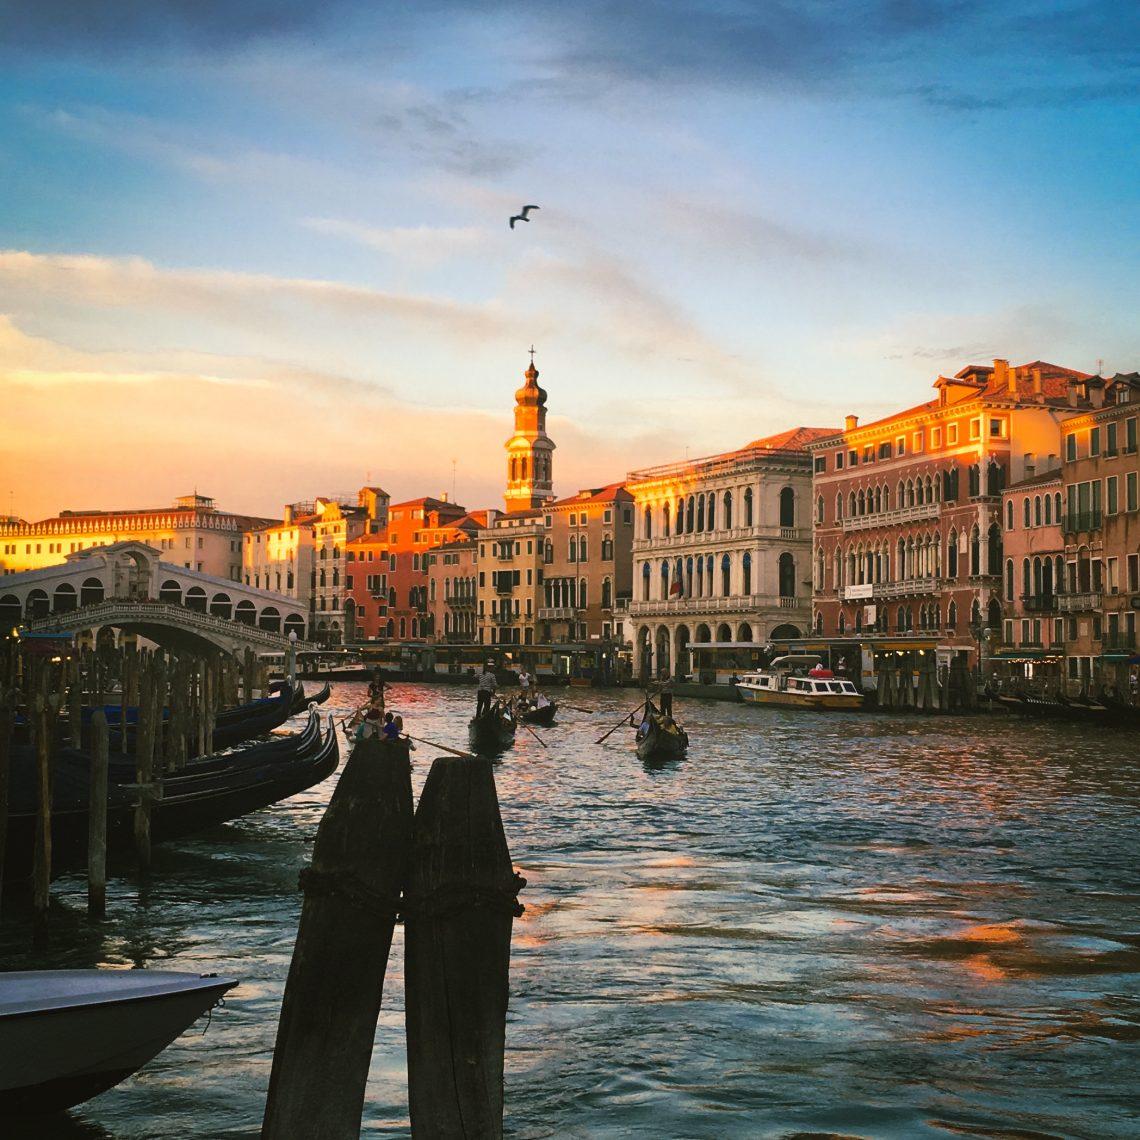 Venedig - die Lagunenstadt